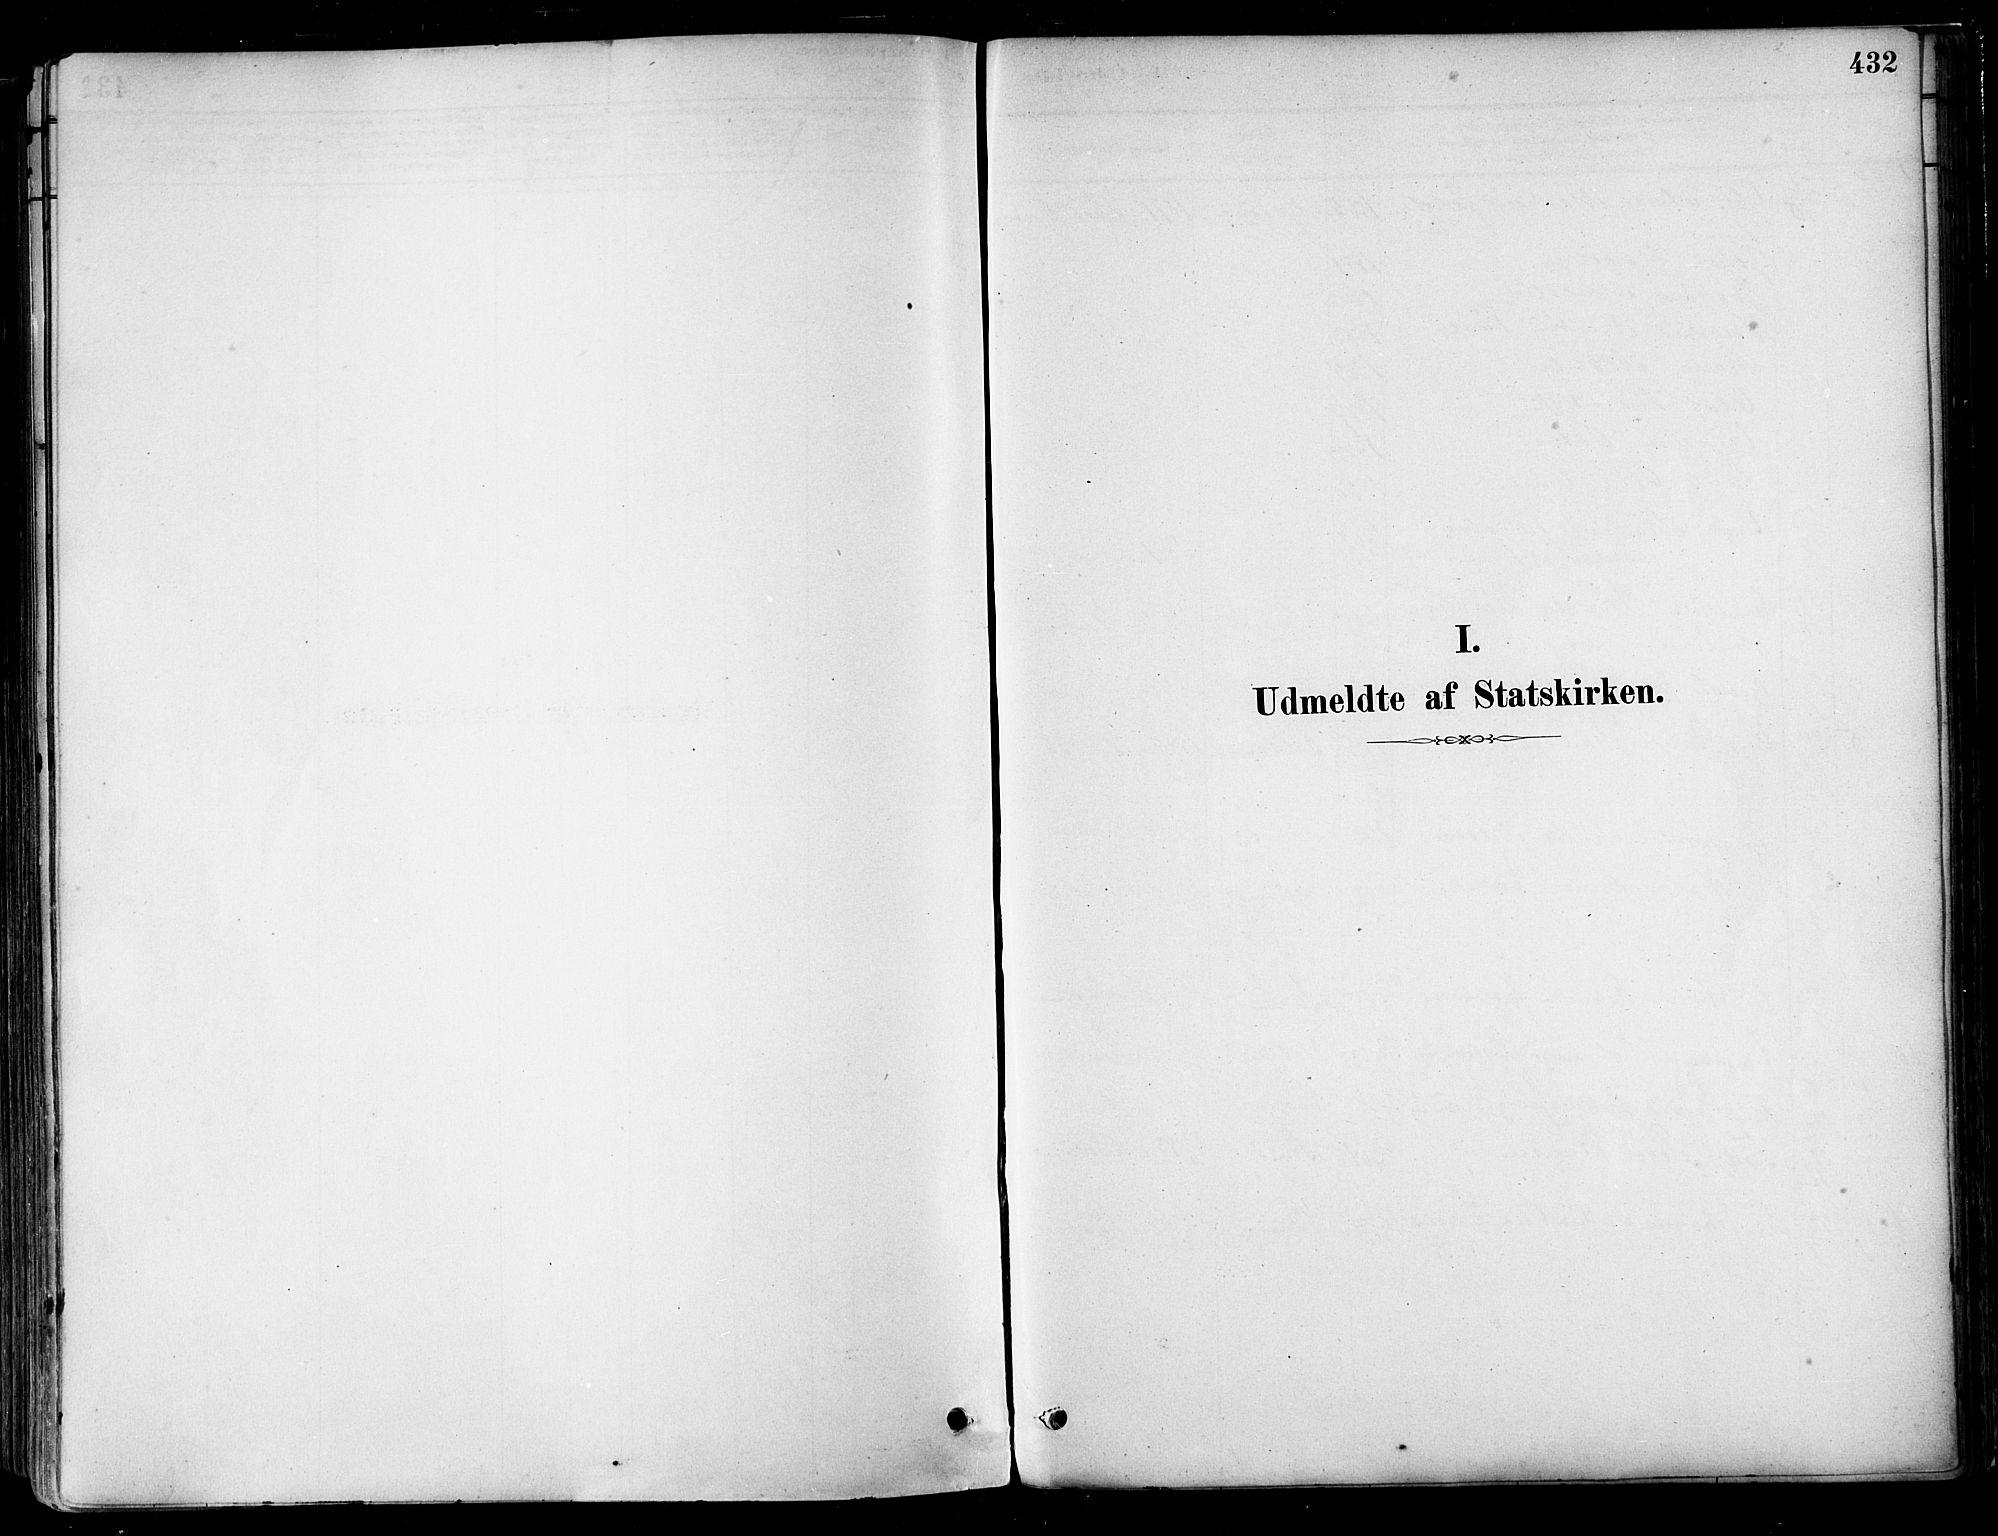 SAT, Ministerialprotokoller, klokkerbøker og fødselsregistre - Nordland, 802/L0054: Ministerialbok nr. 802A01, 1879-1893, s. 432